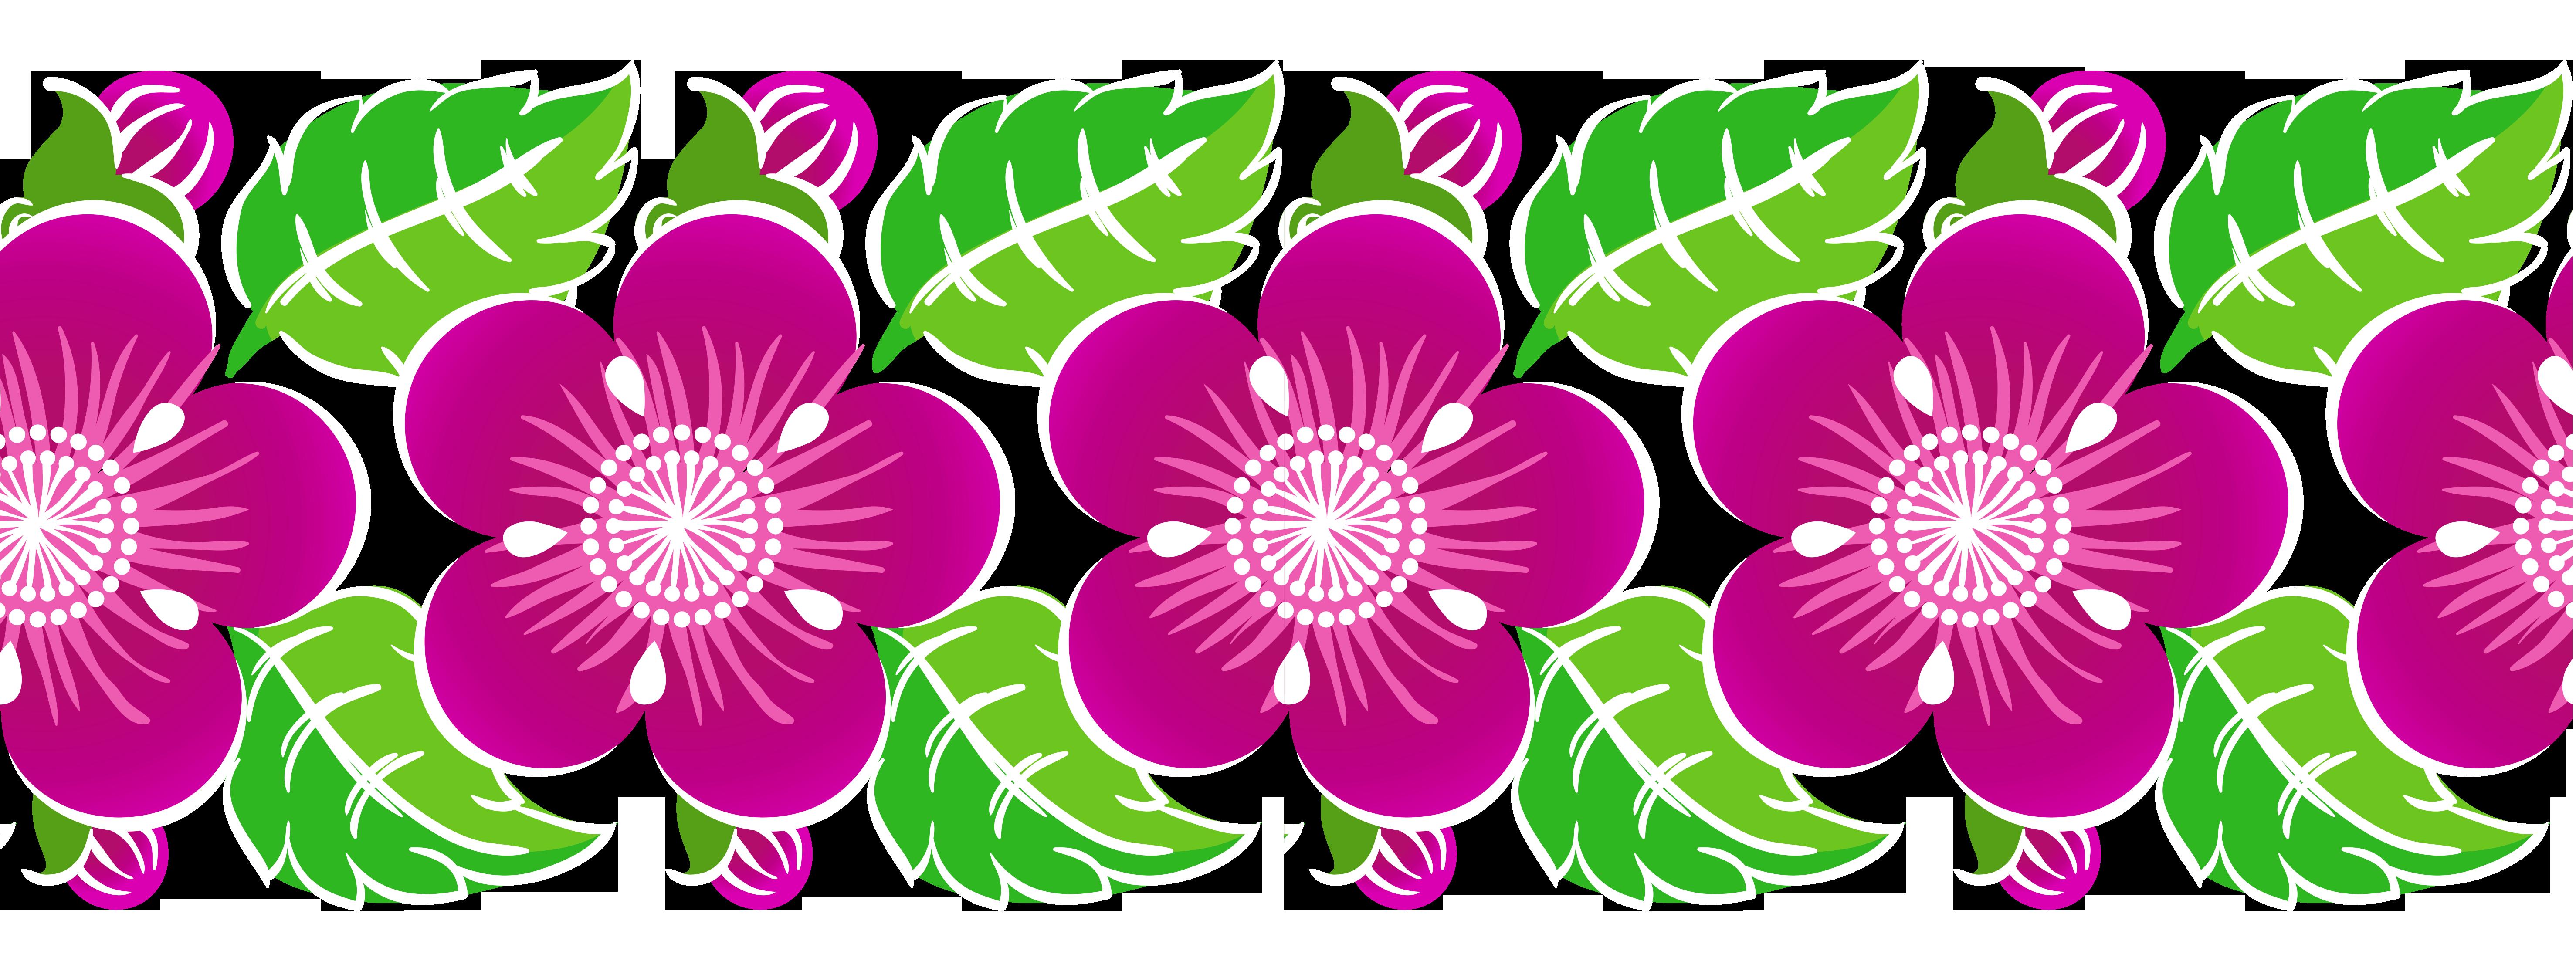 Element clipart floral decoration Clipart Decoration full Yopriceville Floral